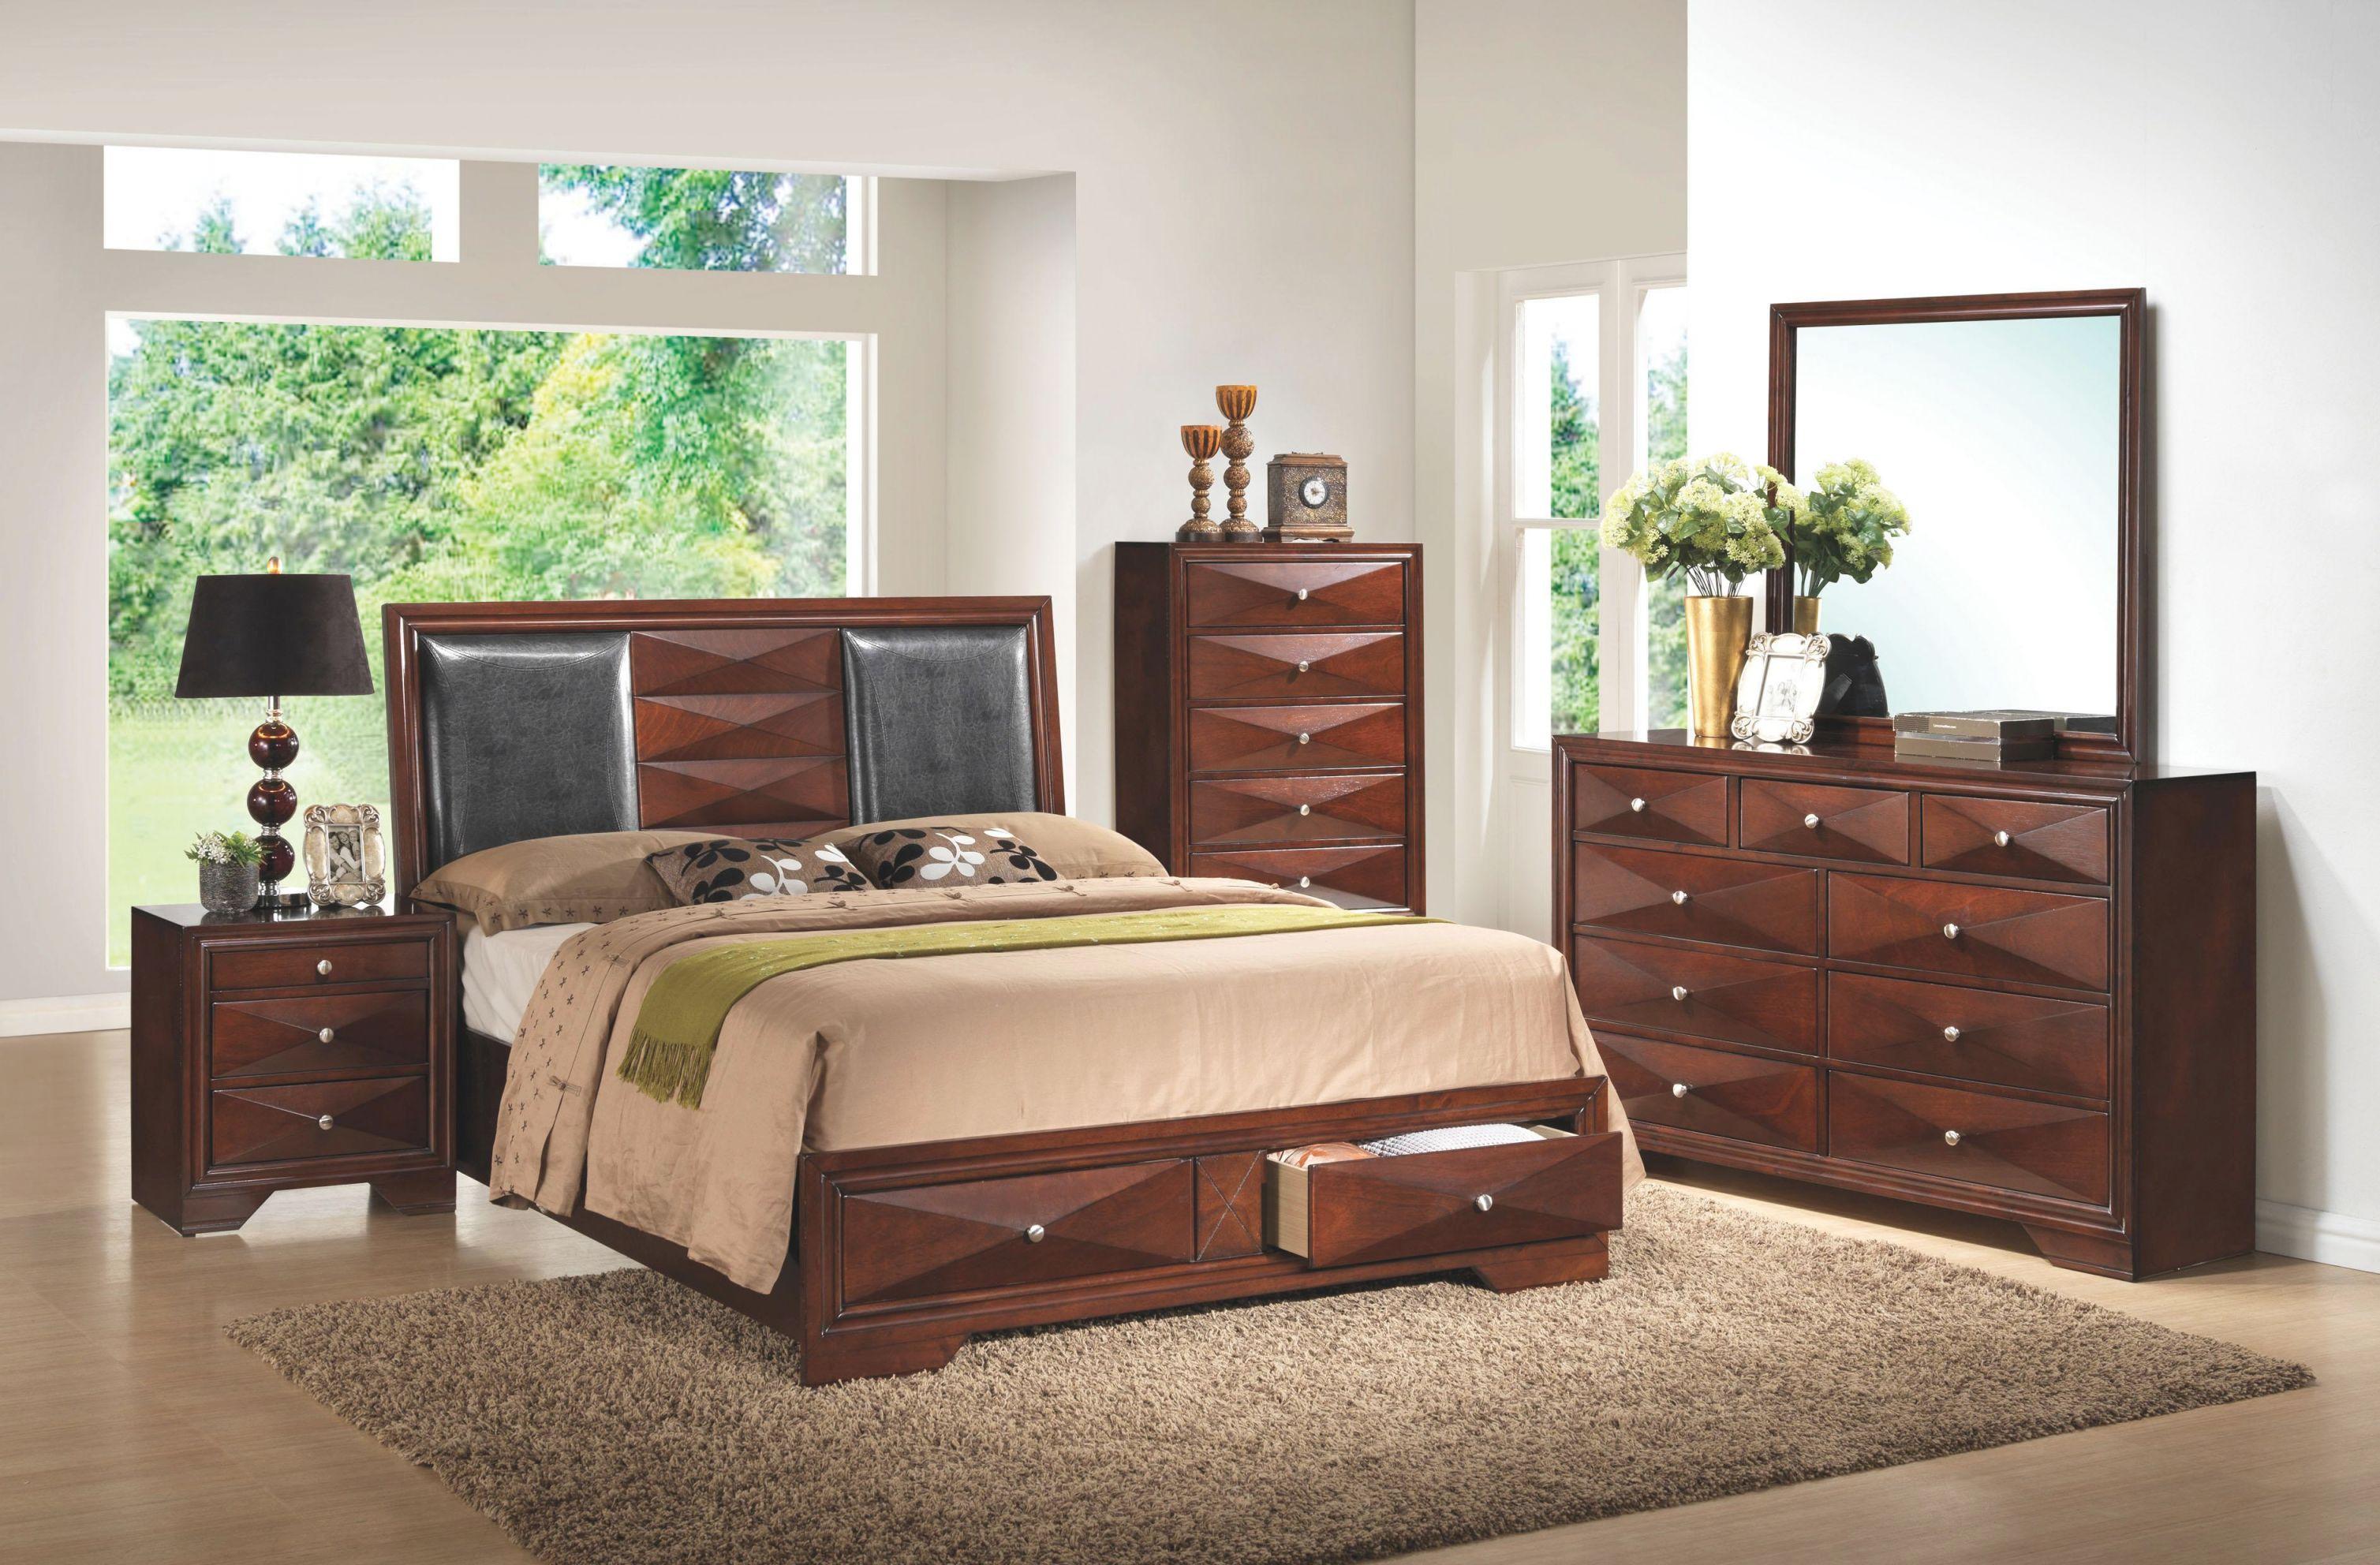 Best Rooms To Go Bedroom Sets Ideas in Bedroom Set Ideas